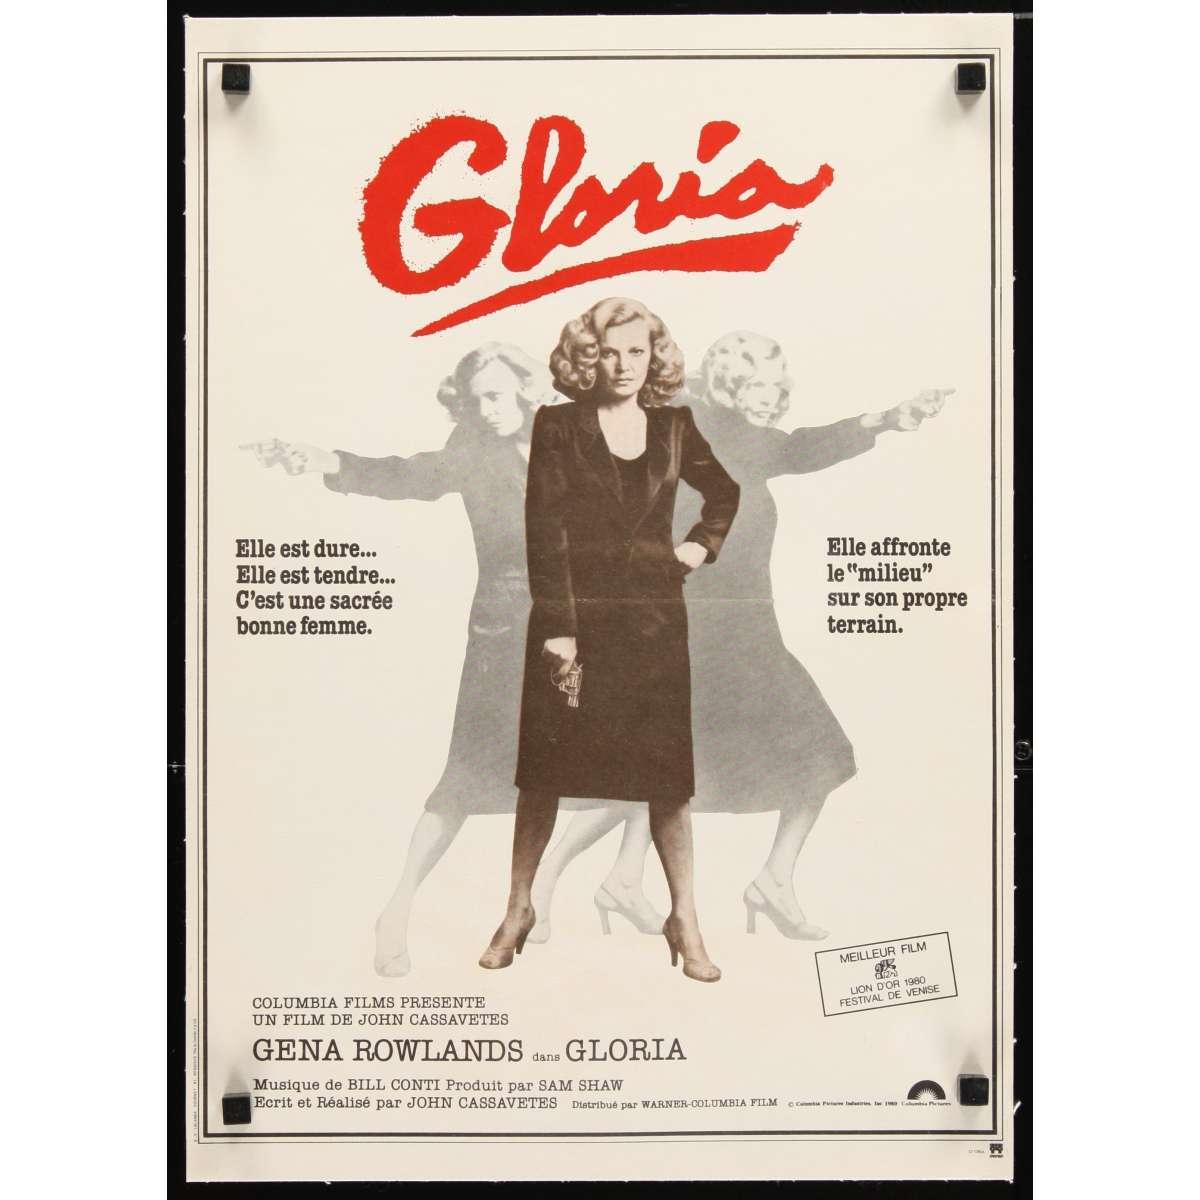 gloria affiche de film affiche originale de cin ma. Black Bedroom Furniture Sets. Home Design Ideas